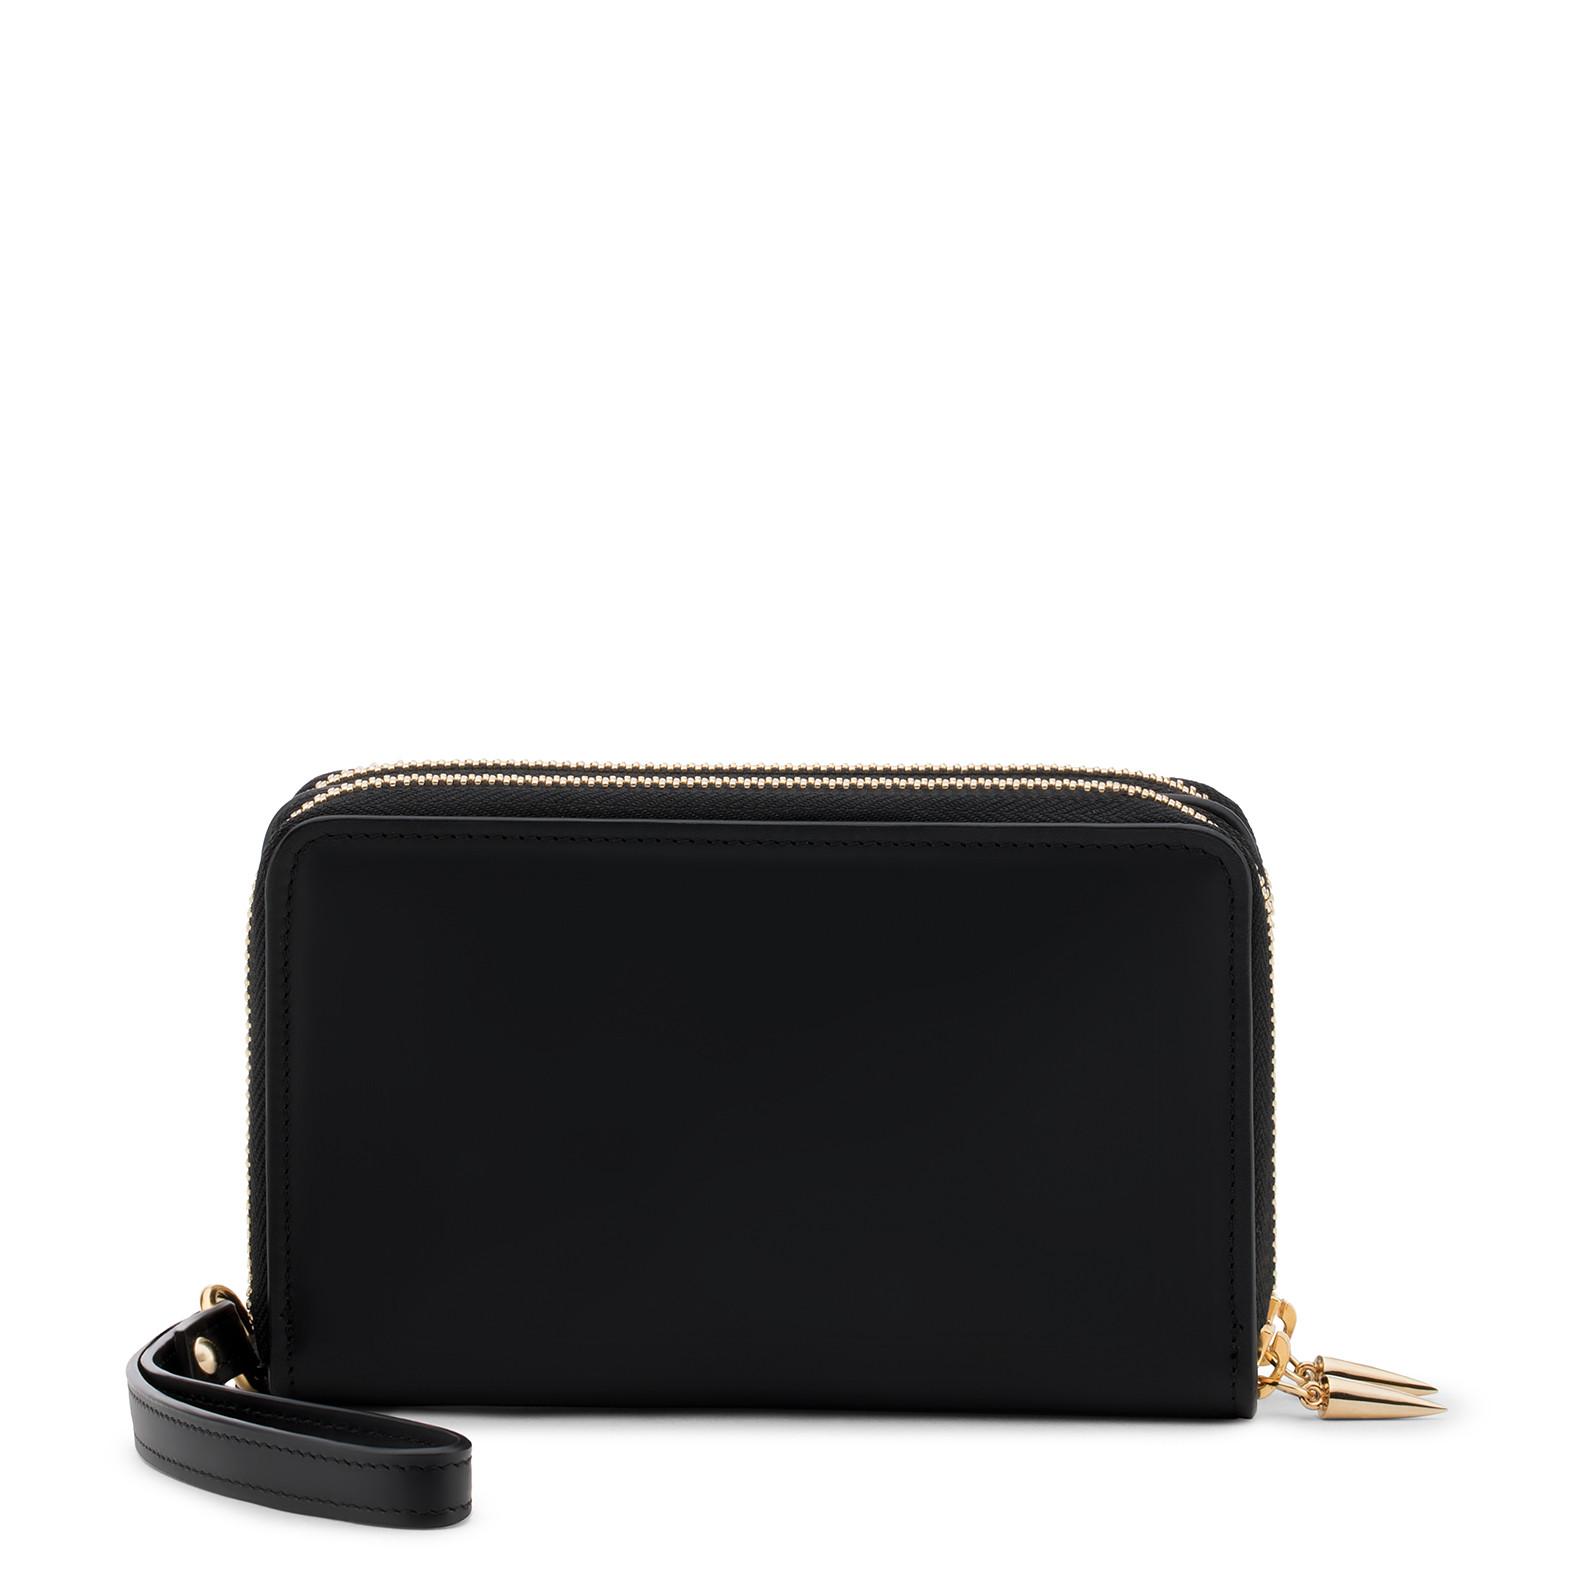 Giuseppe Zanotti - Leather Wallet Mathilde In Black